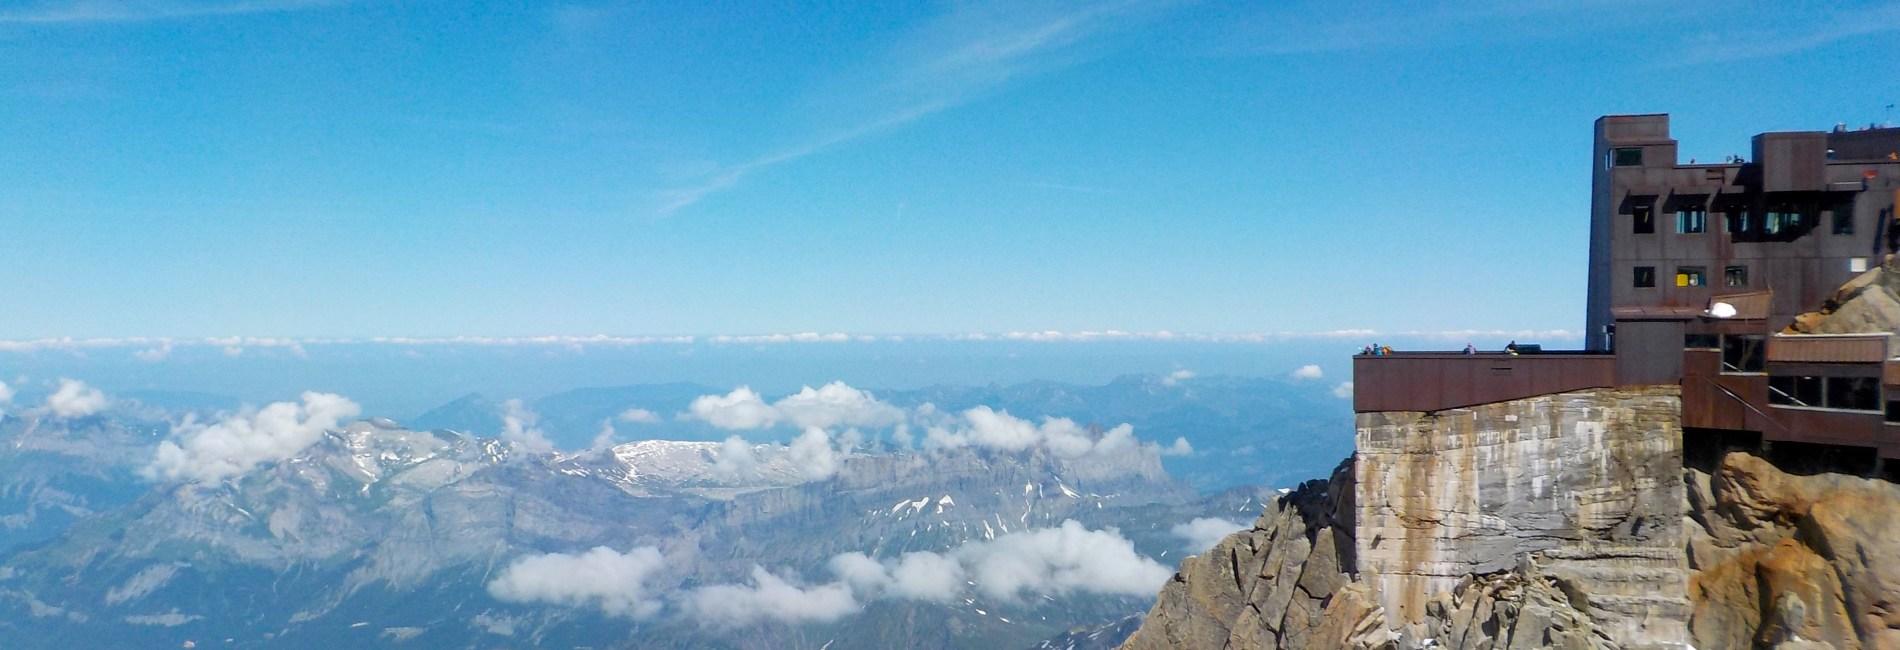 1-Day Trip To Chamonix, France: Itinerary